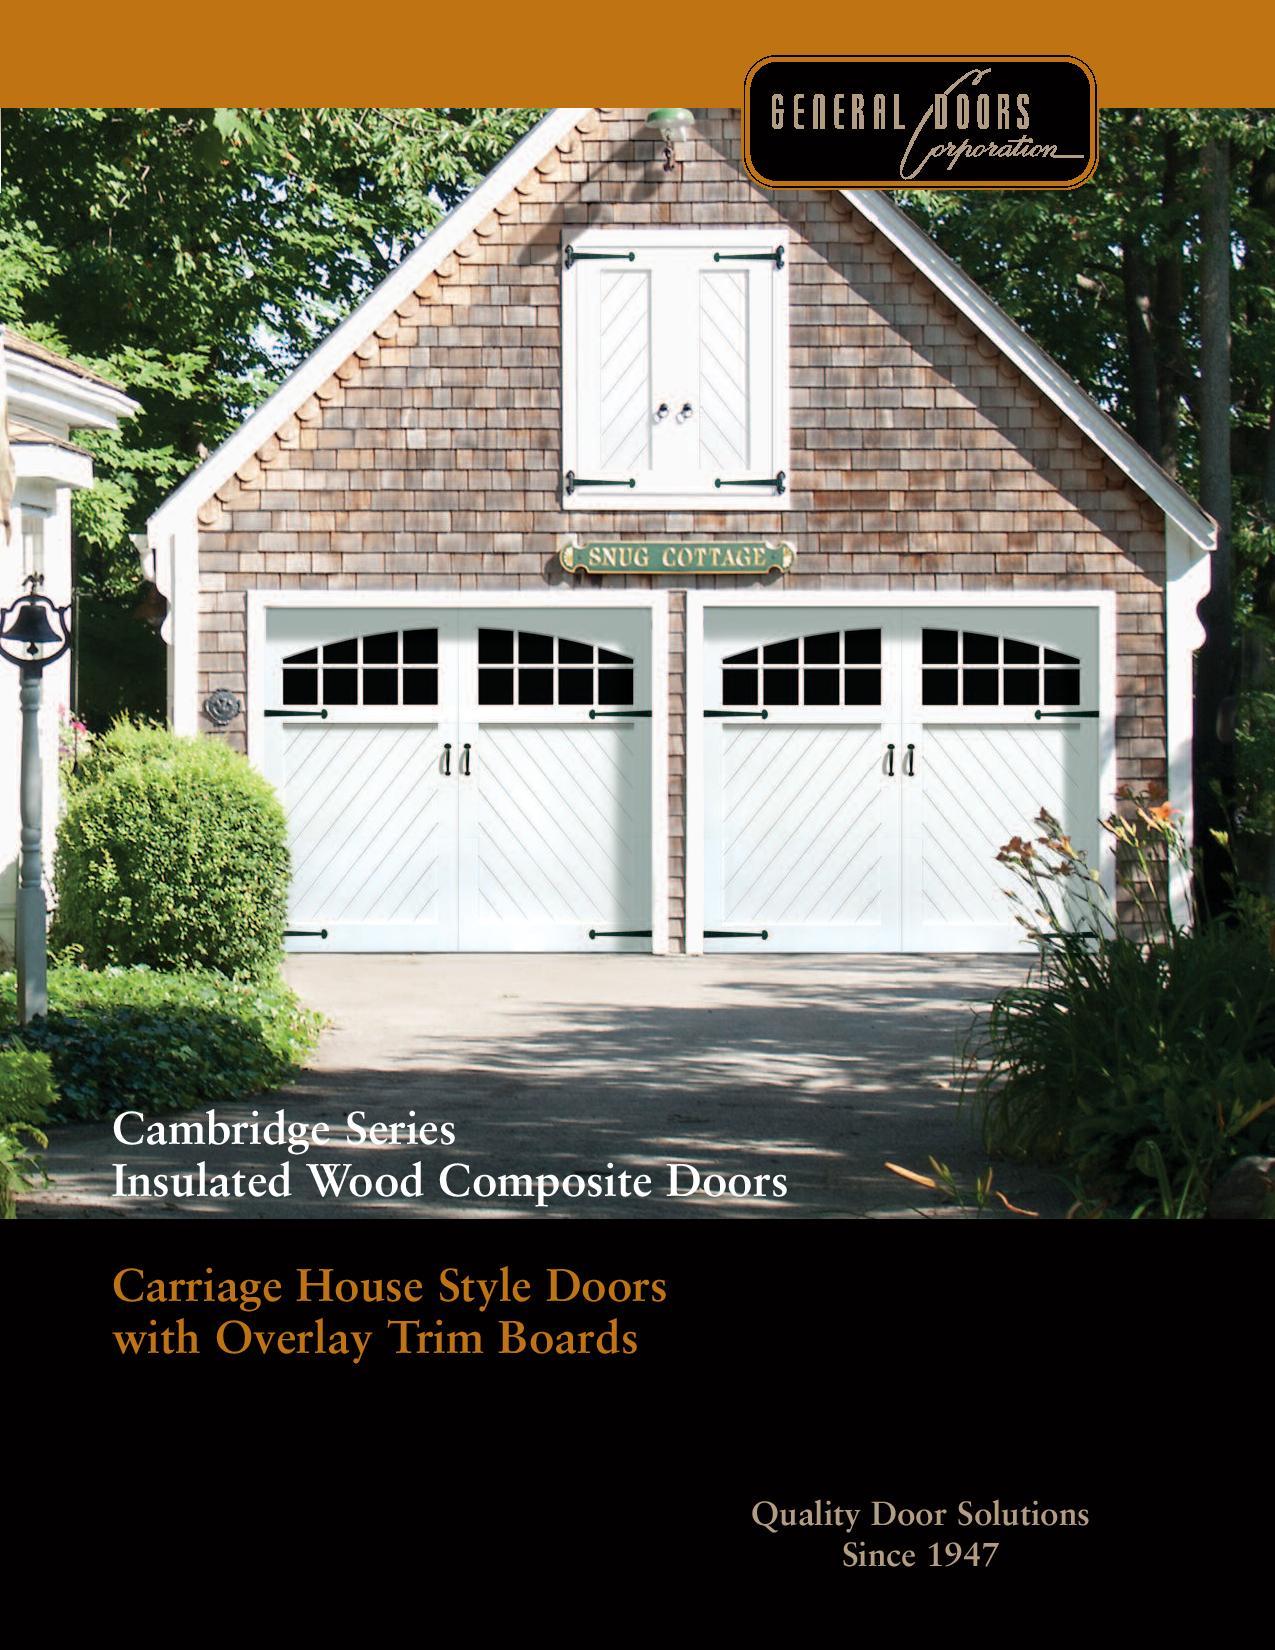 Cambridge Series Insulated Wood Composite Garage Doors By General